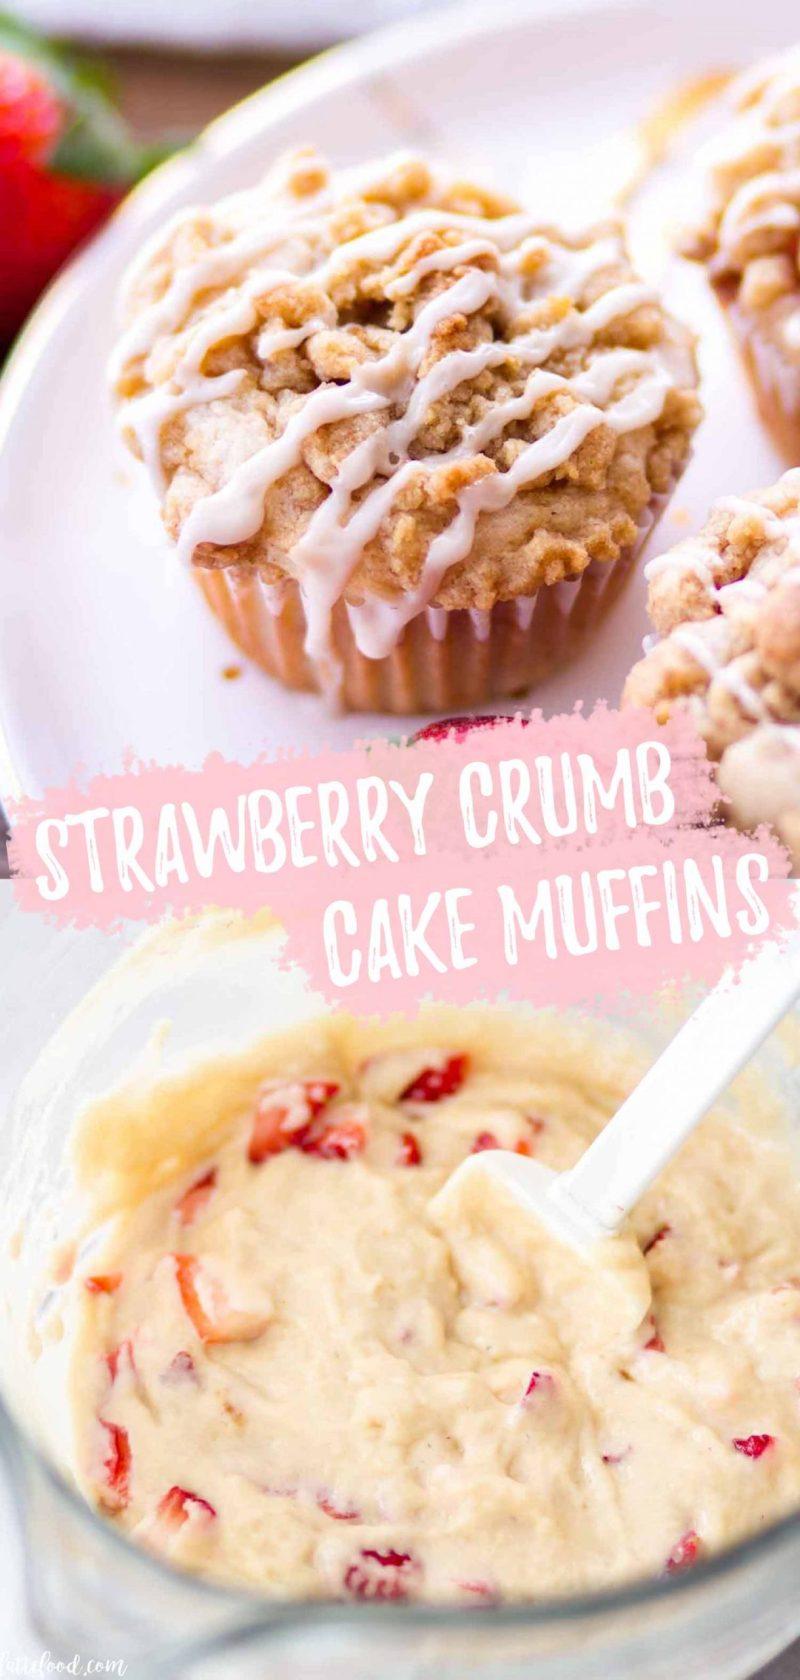 strawberry crumb cake muffins with vanilla glaze collage